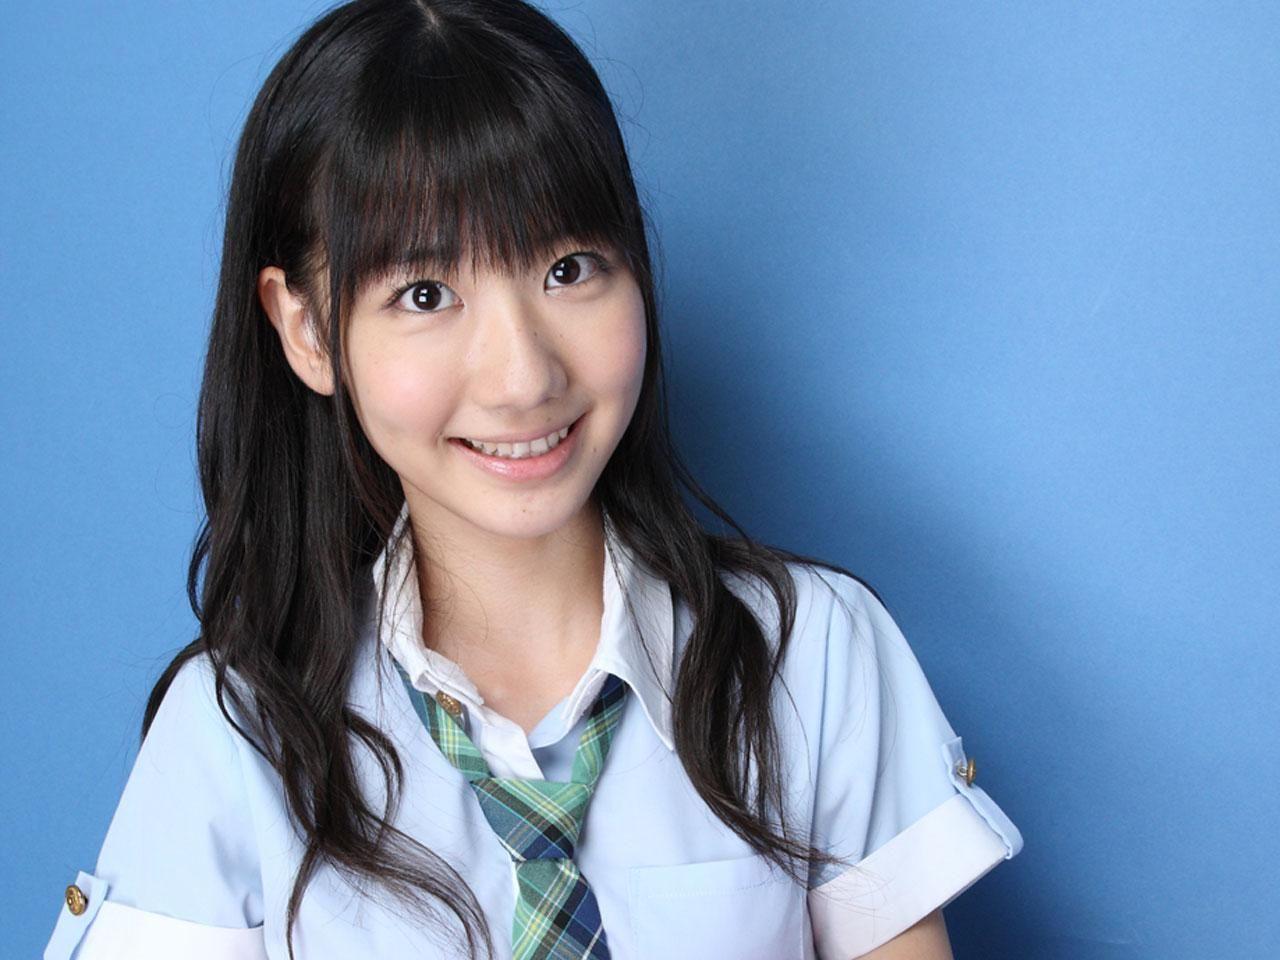 akb48核心_AKB48的恋するフォーチュンクッキー 这个人是谁_百度知道